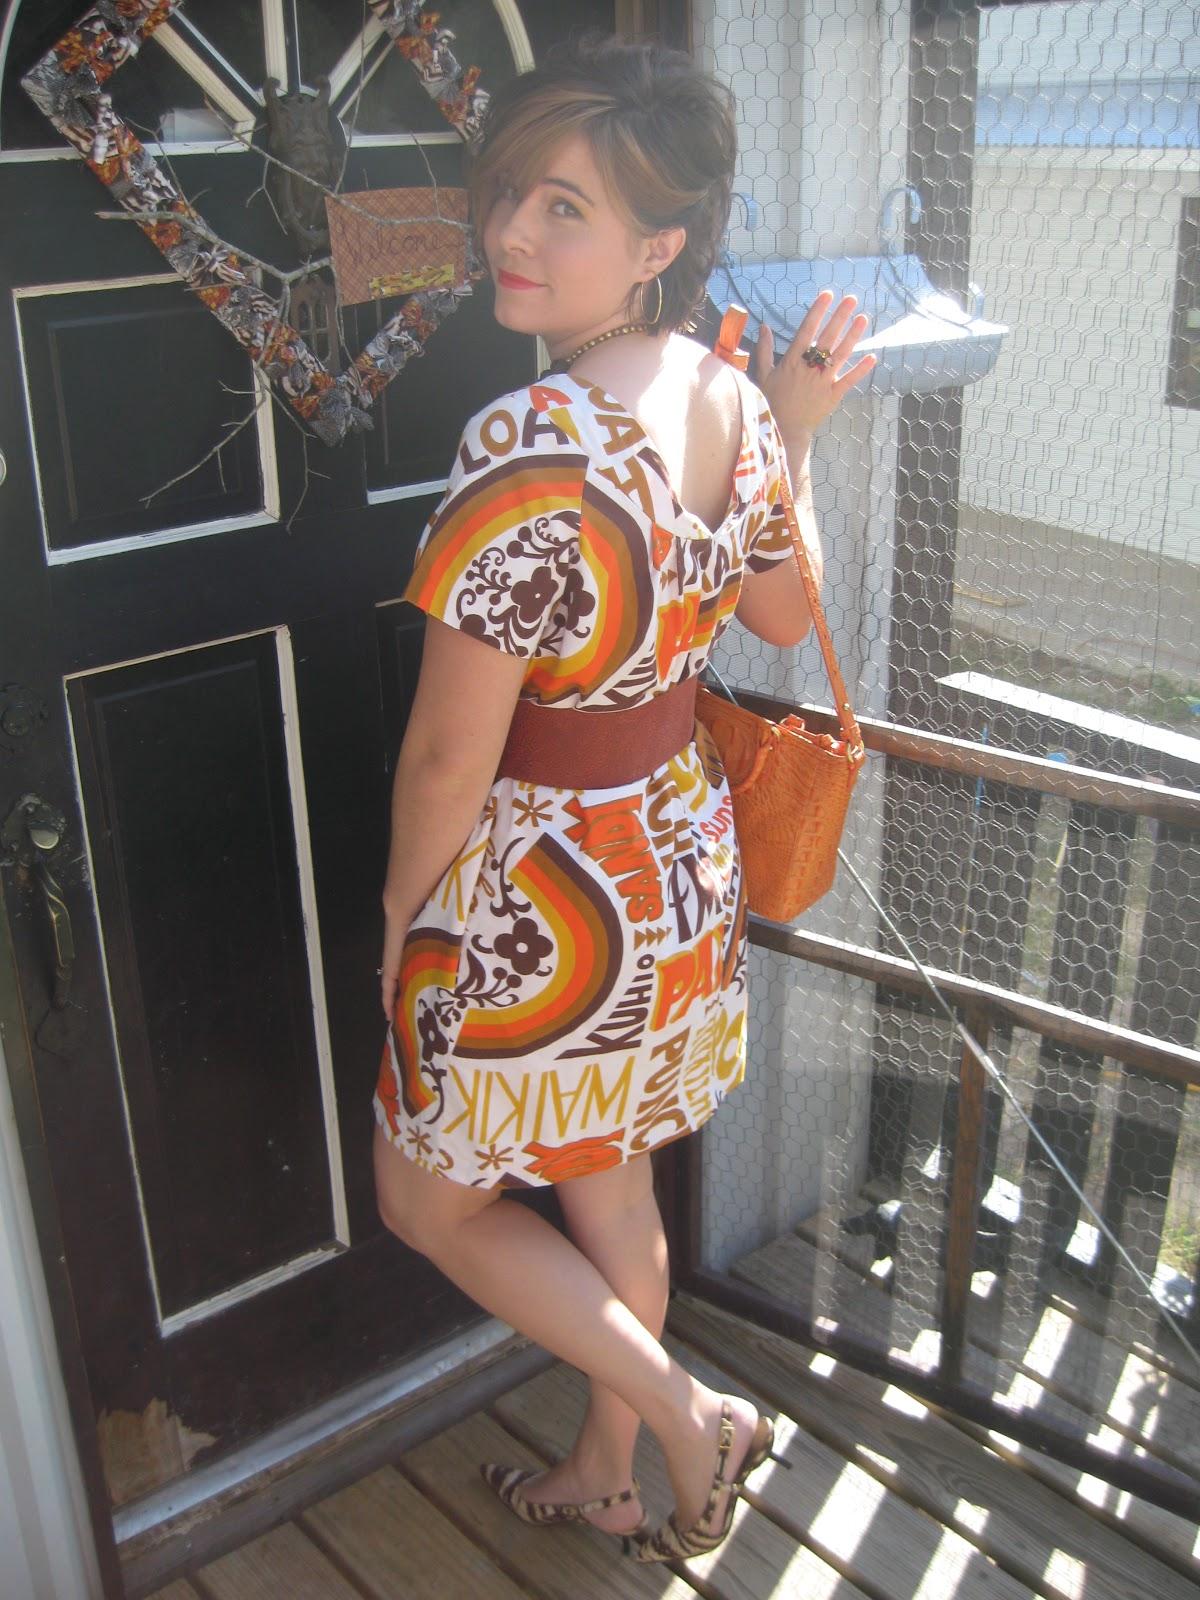 6aa8c46fe7b Dress Up, Not Down!: Walmart in High Heels